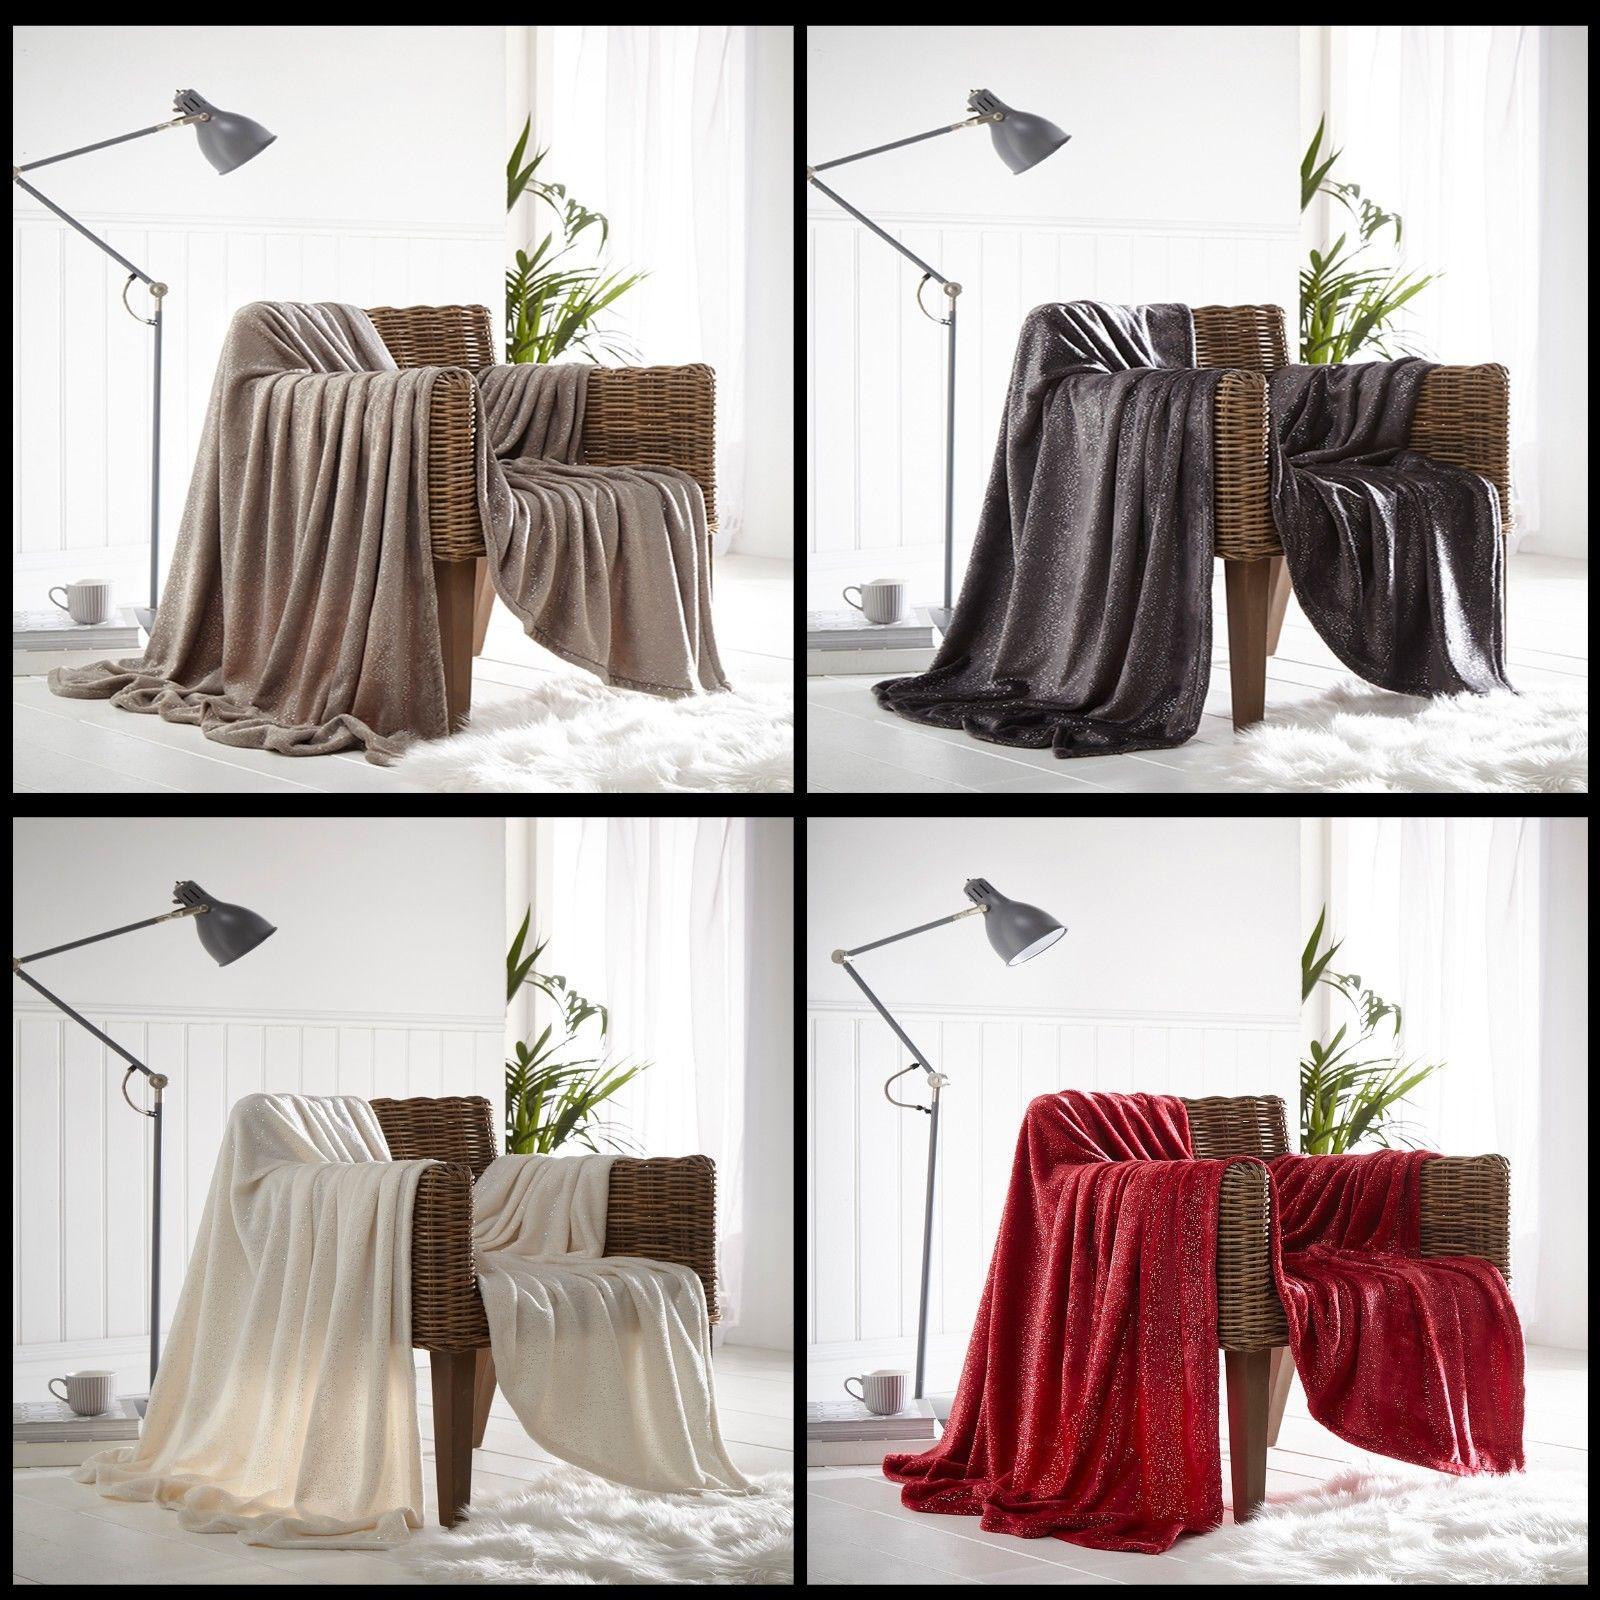 PIERIDAE Soft Fleece Warm RUSTIC STAG Throws Blankets